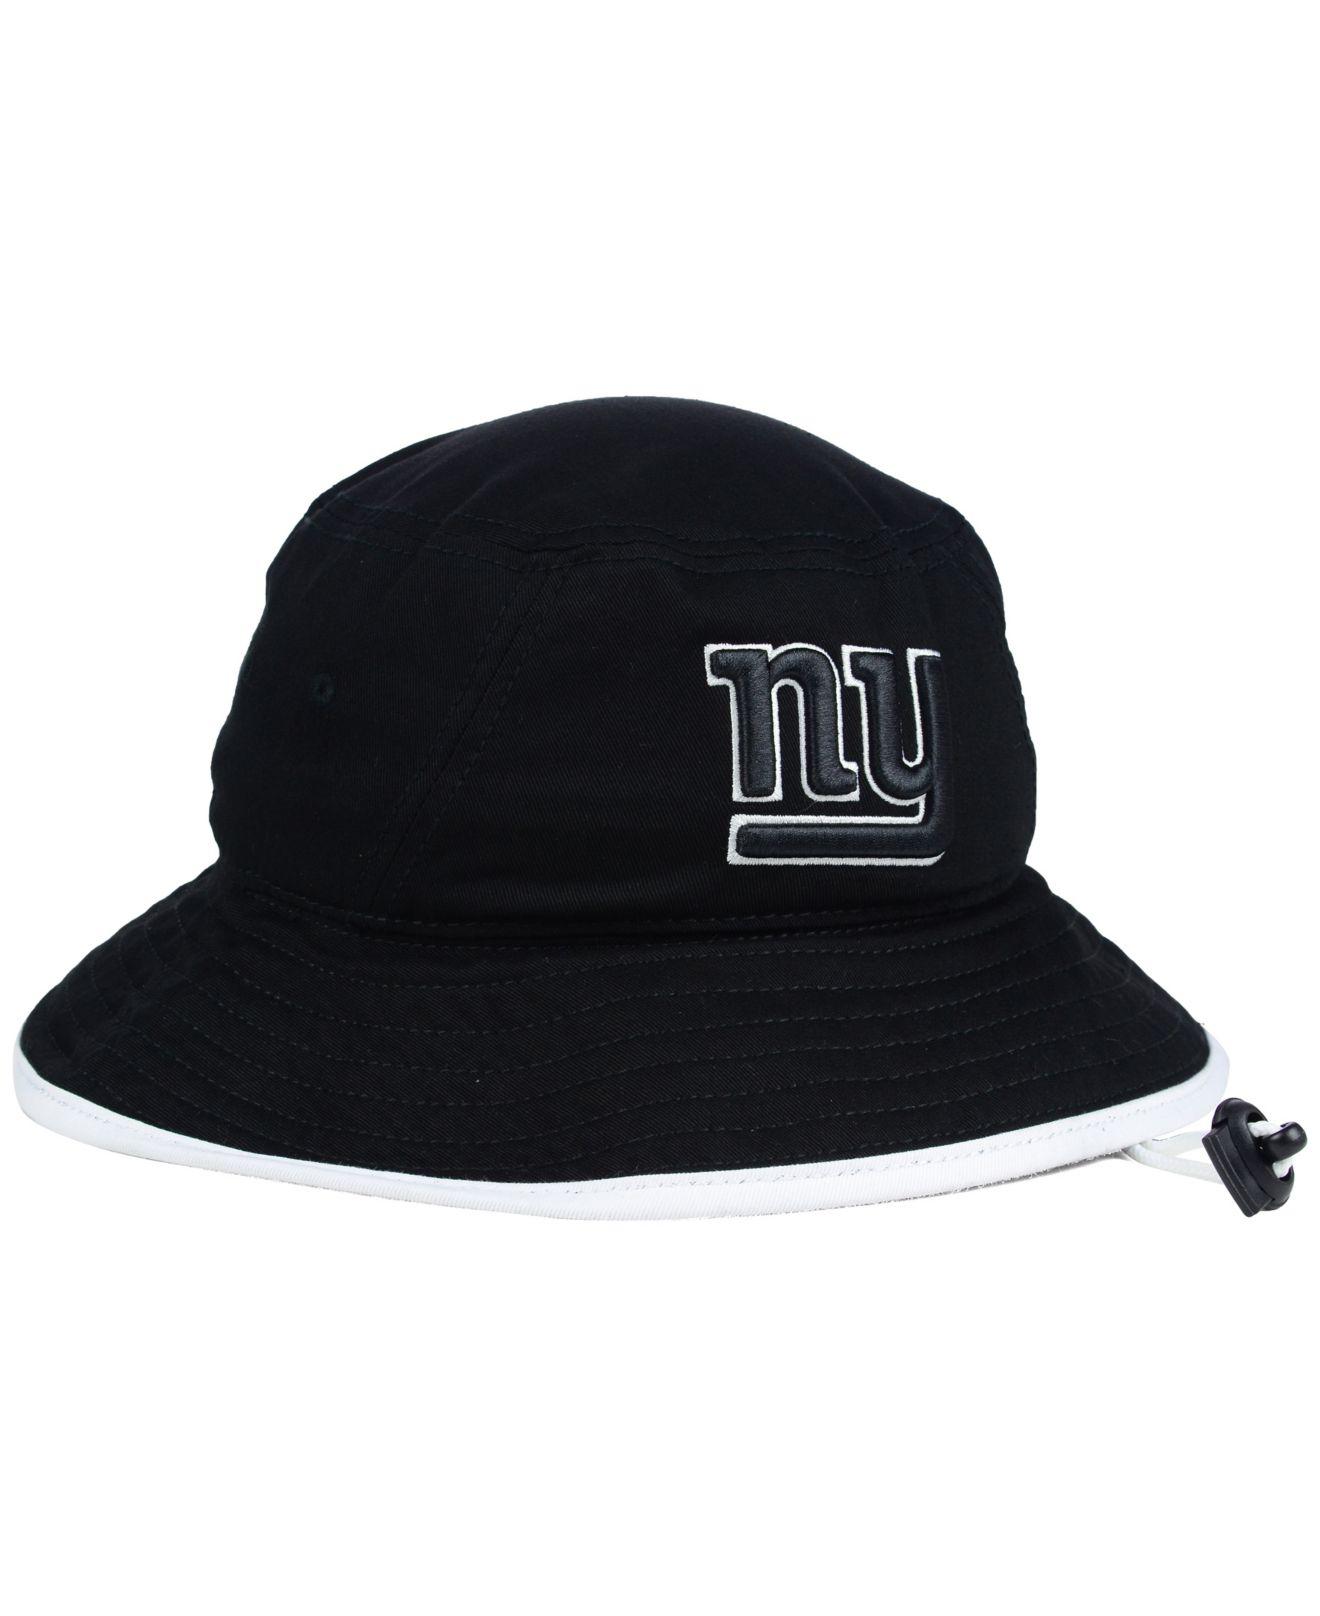 Lyst - KTZ New York Giants Nfl Black White Bucket Hat in Black 18333db5392